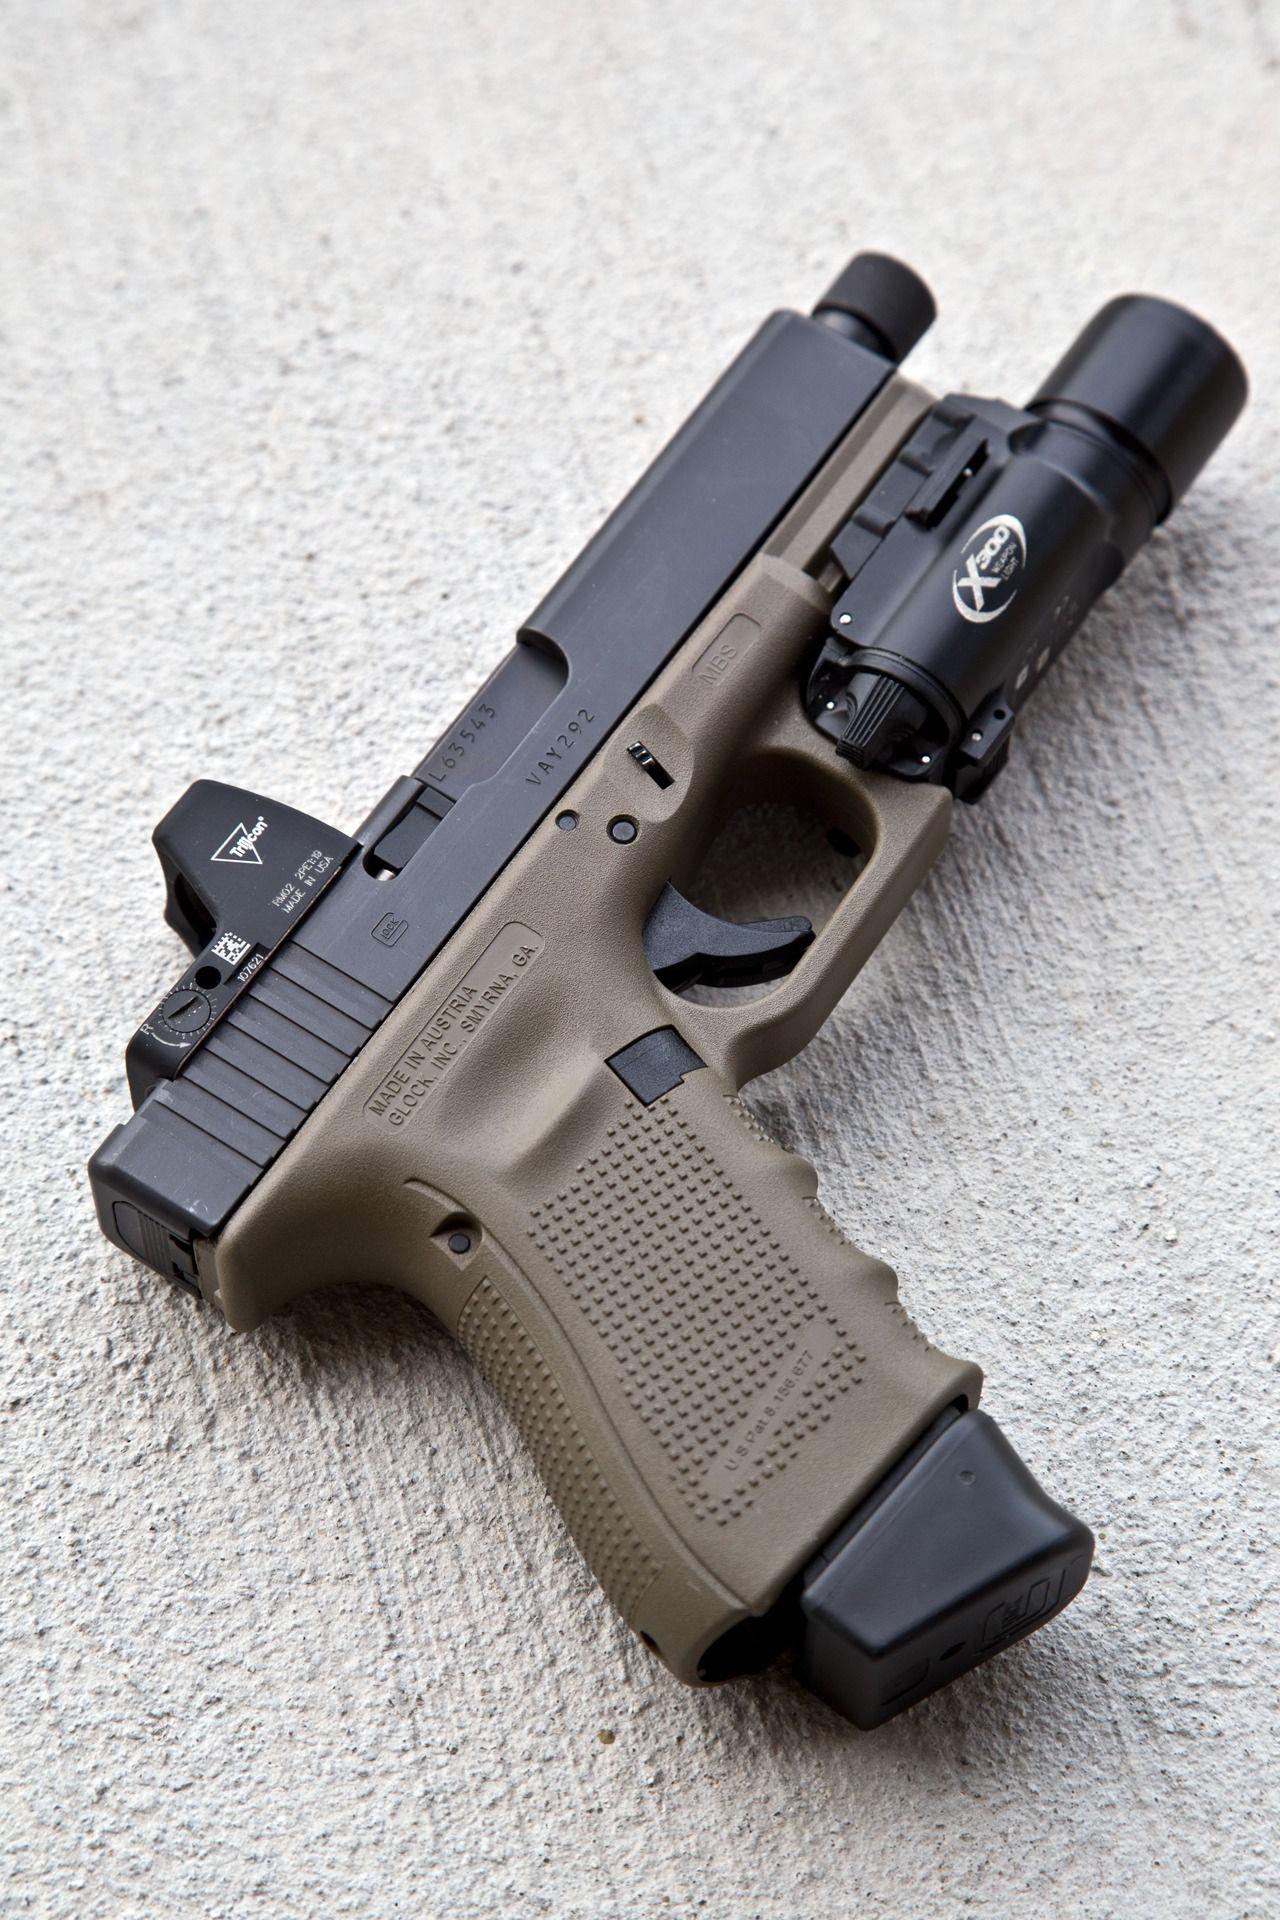 FDE Glock 19 Gen 4 + Trijicon RMR + Surefire x300 | Guns and Knives ...